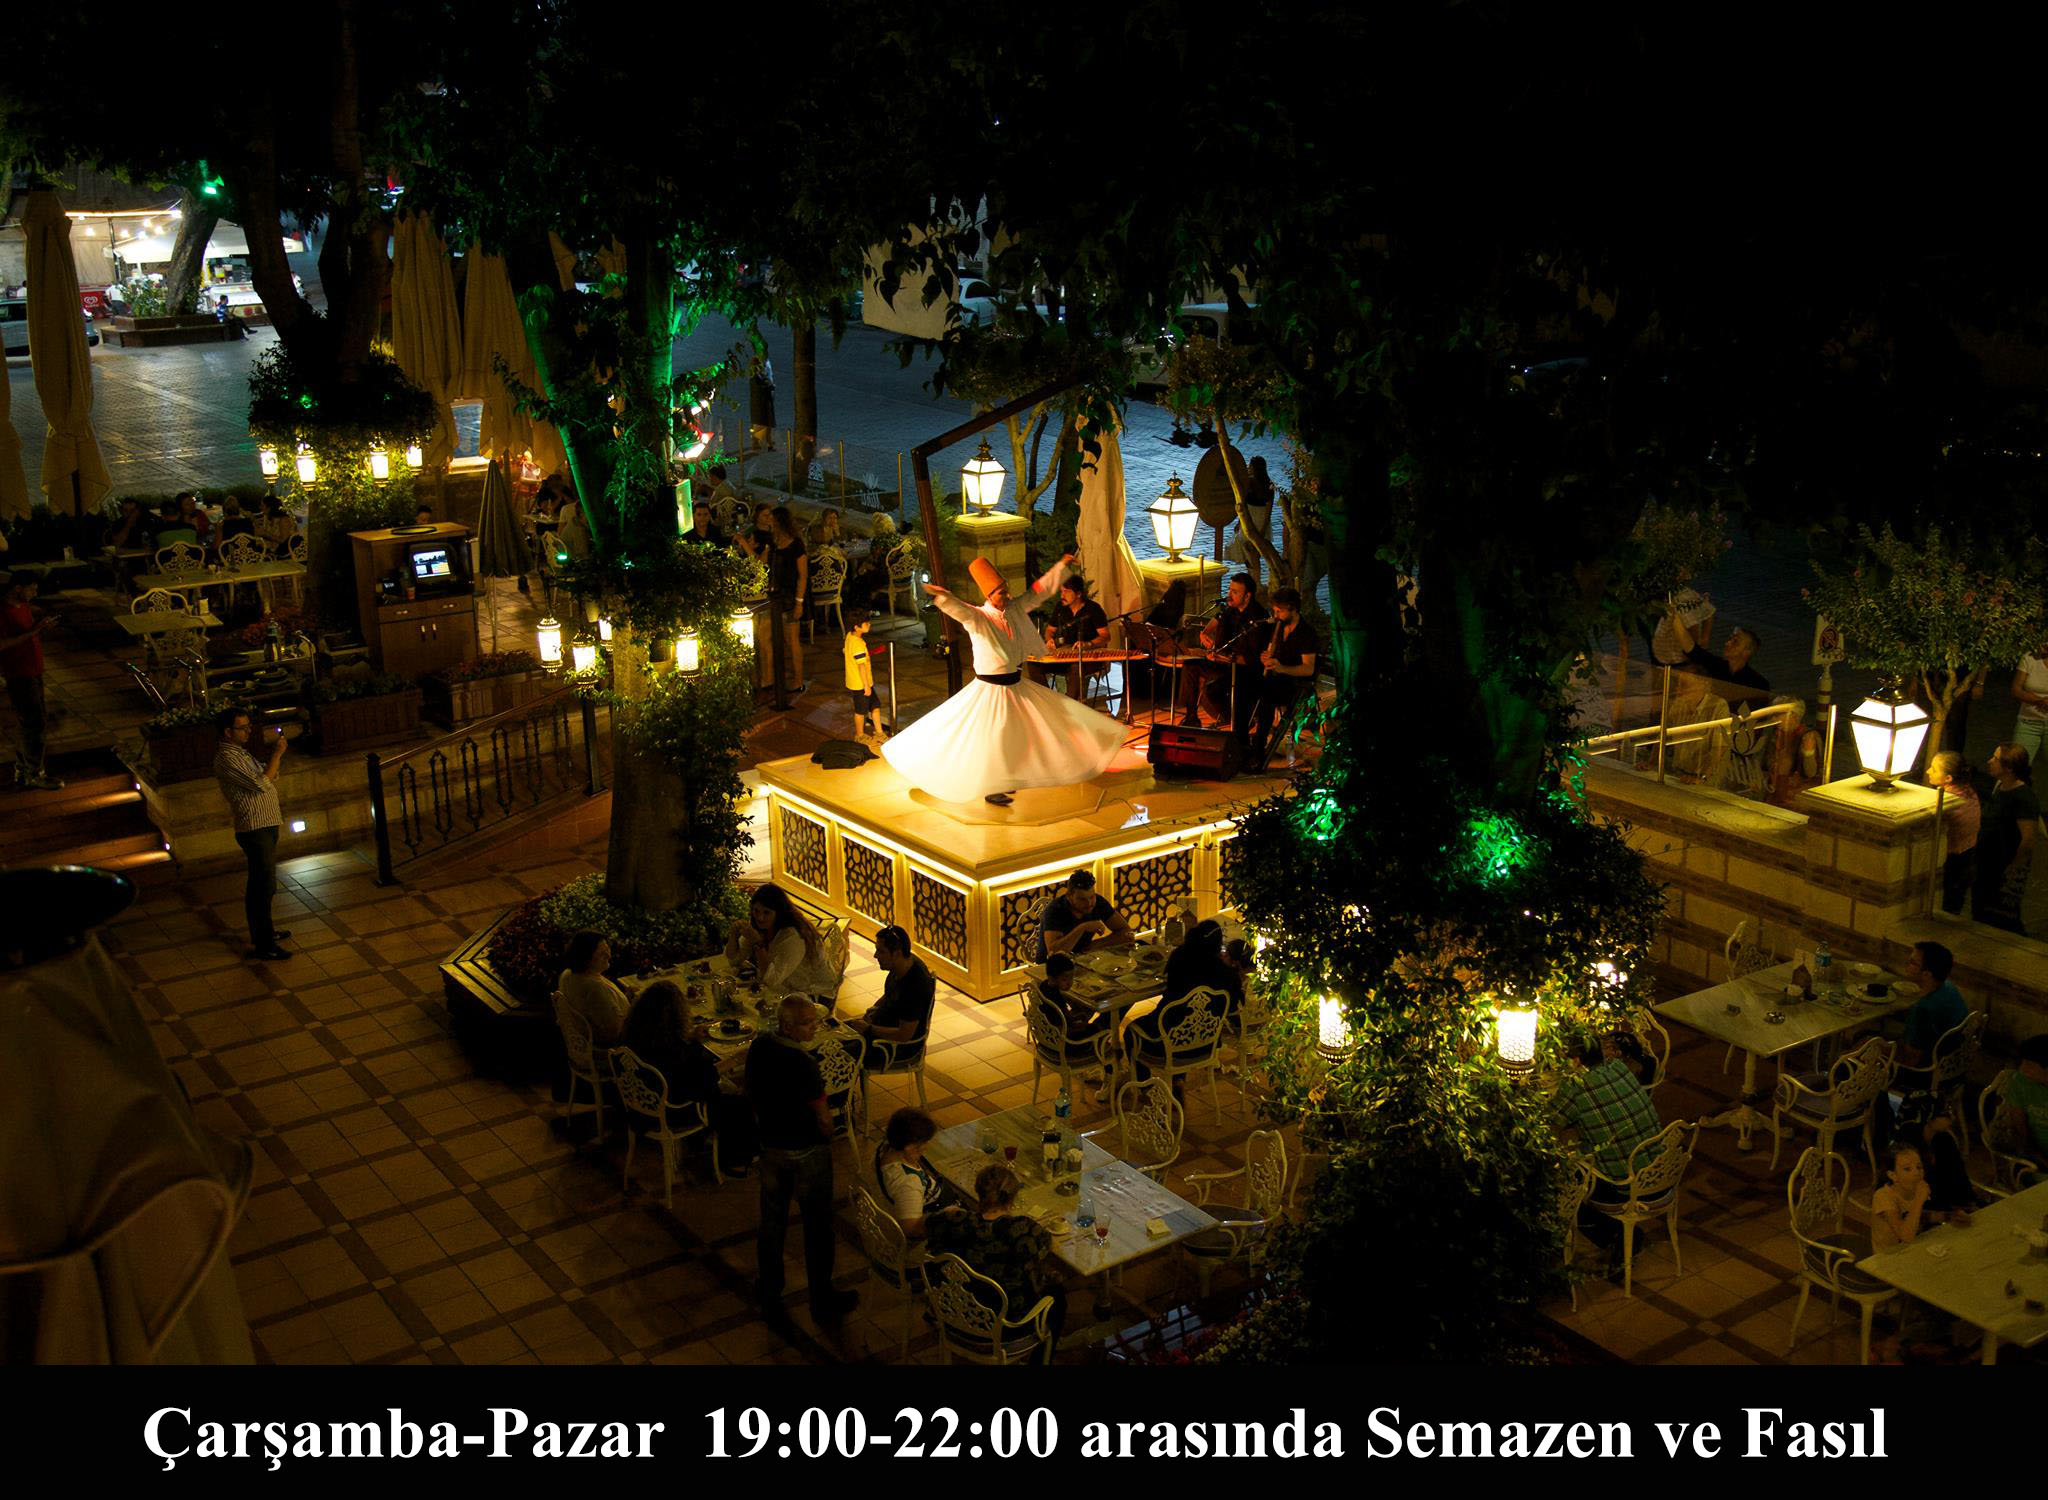 2017 Semazen 1900-2200